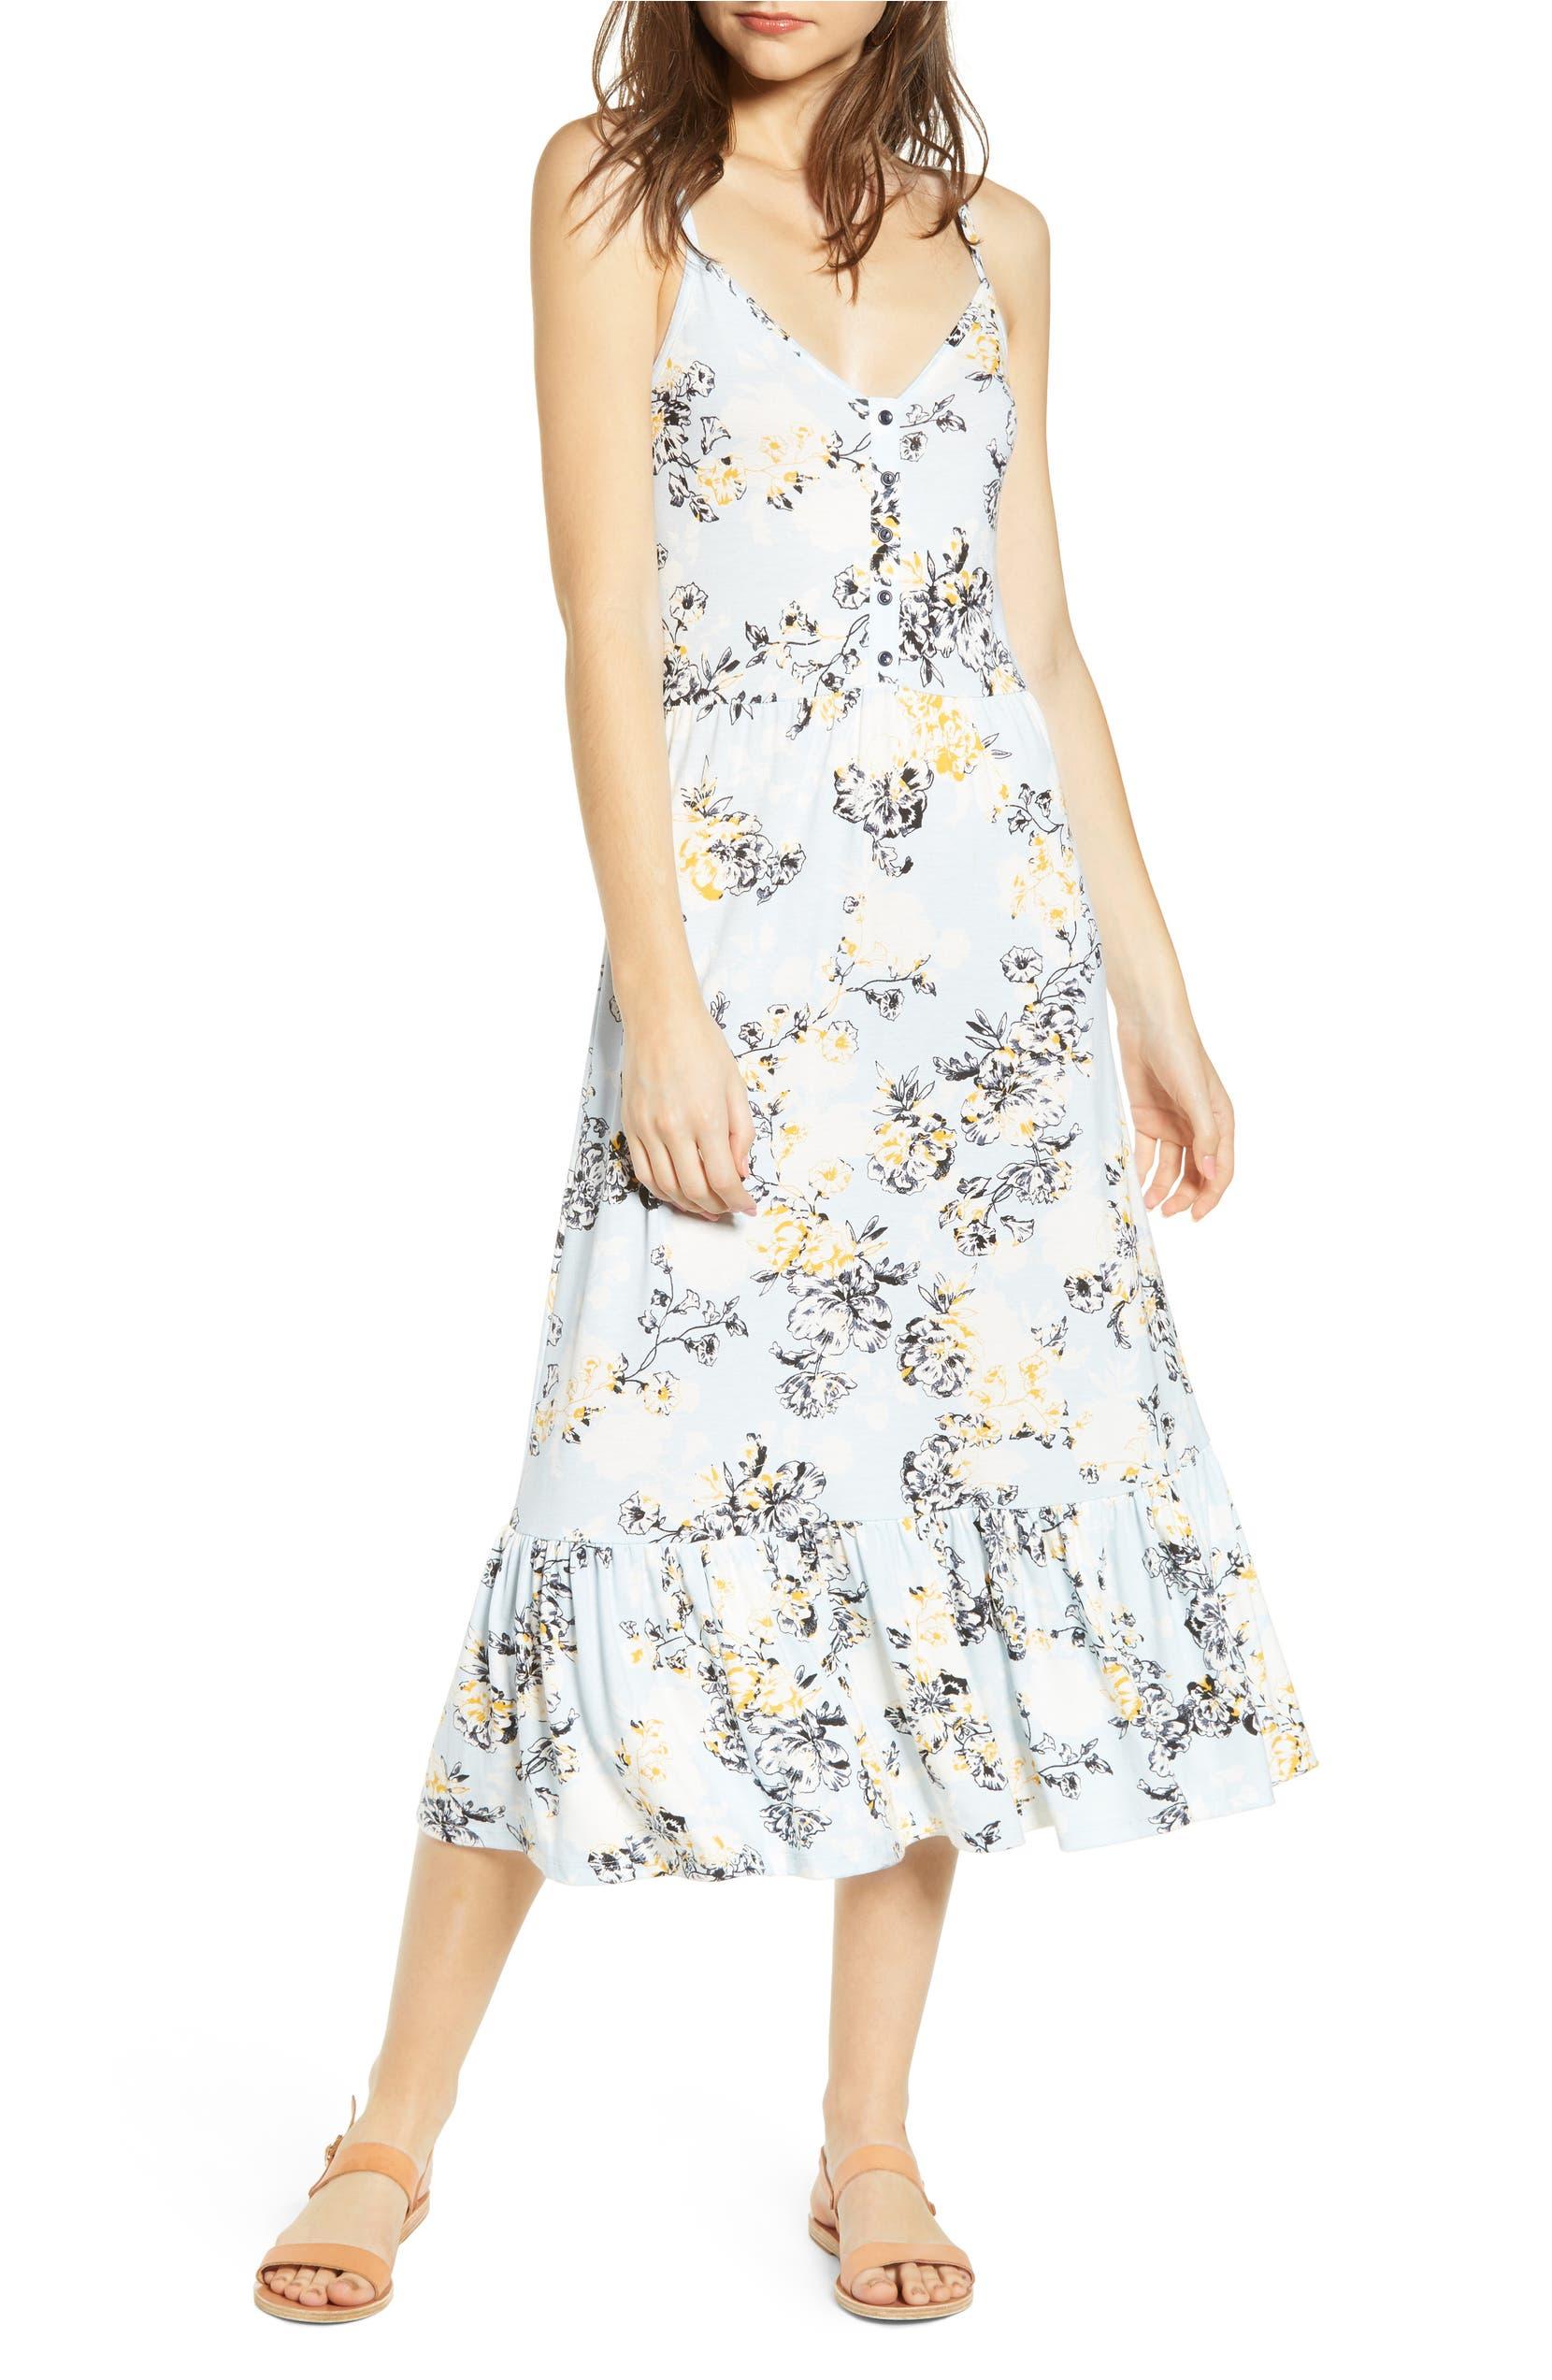 Floral Print Ruffle Hem Sundress, Main, color, BLUE DRIFT DETAIL FLORAL